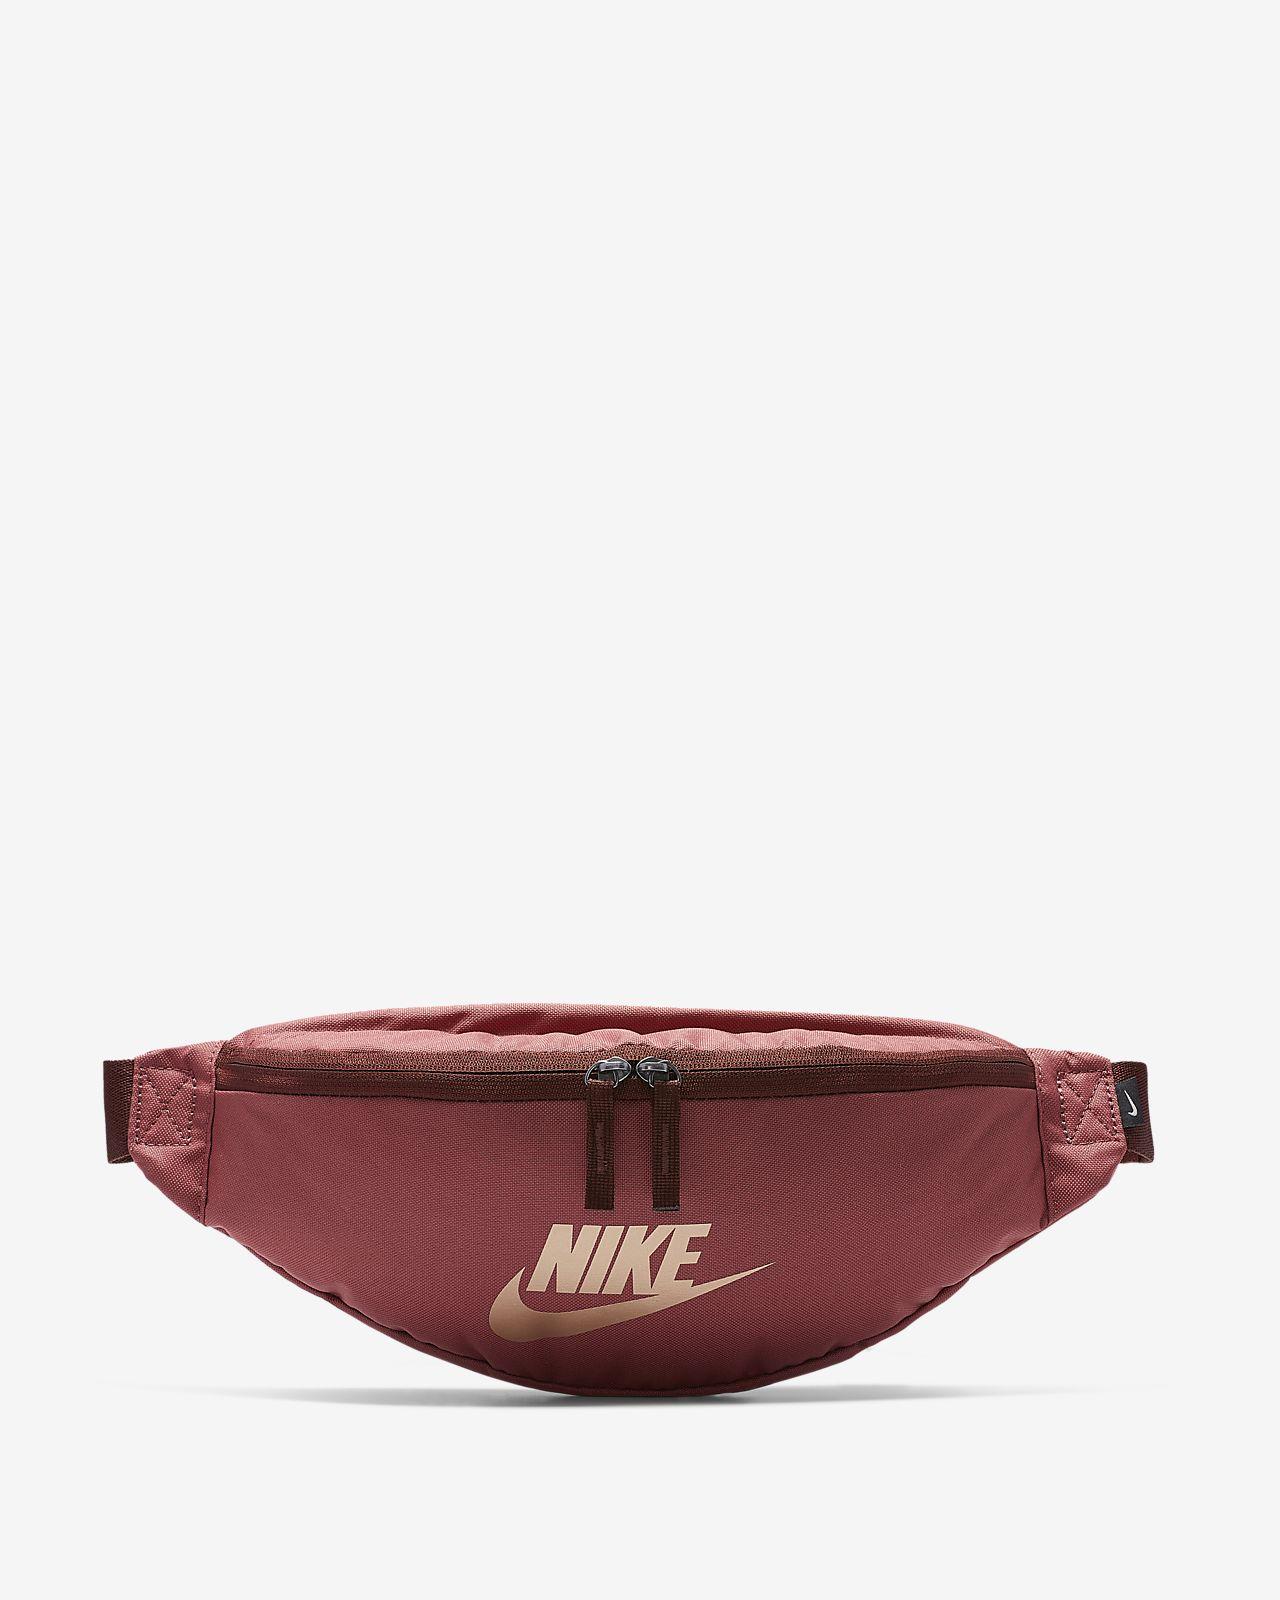 how to buy sneakers first look Sac banane Nike Sportswear Heritage